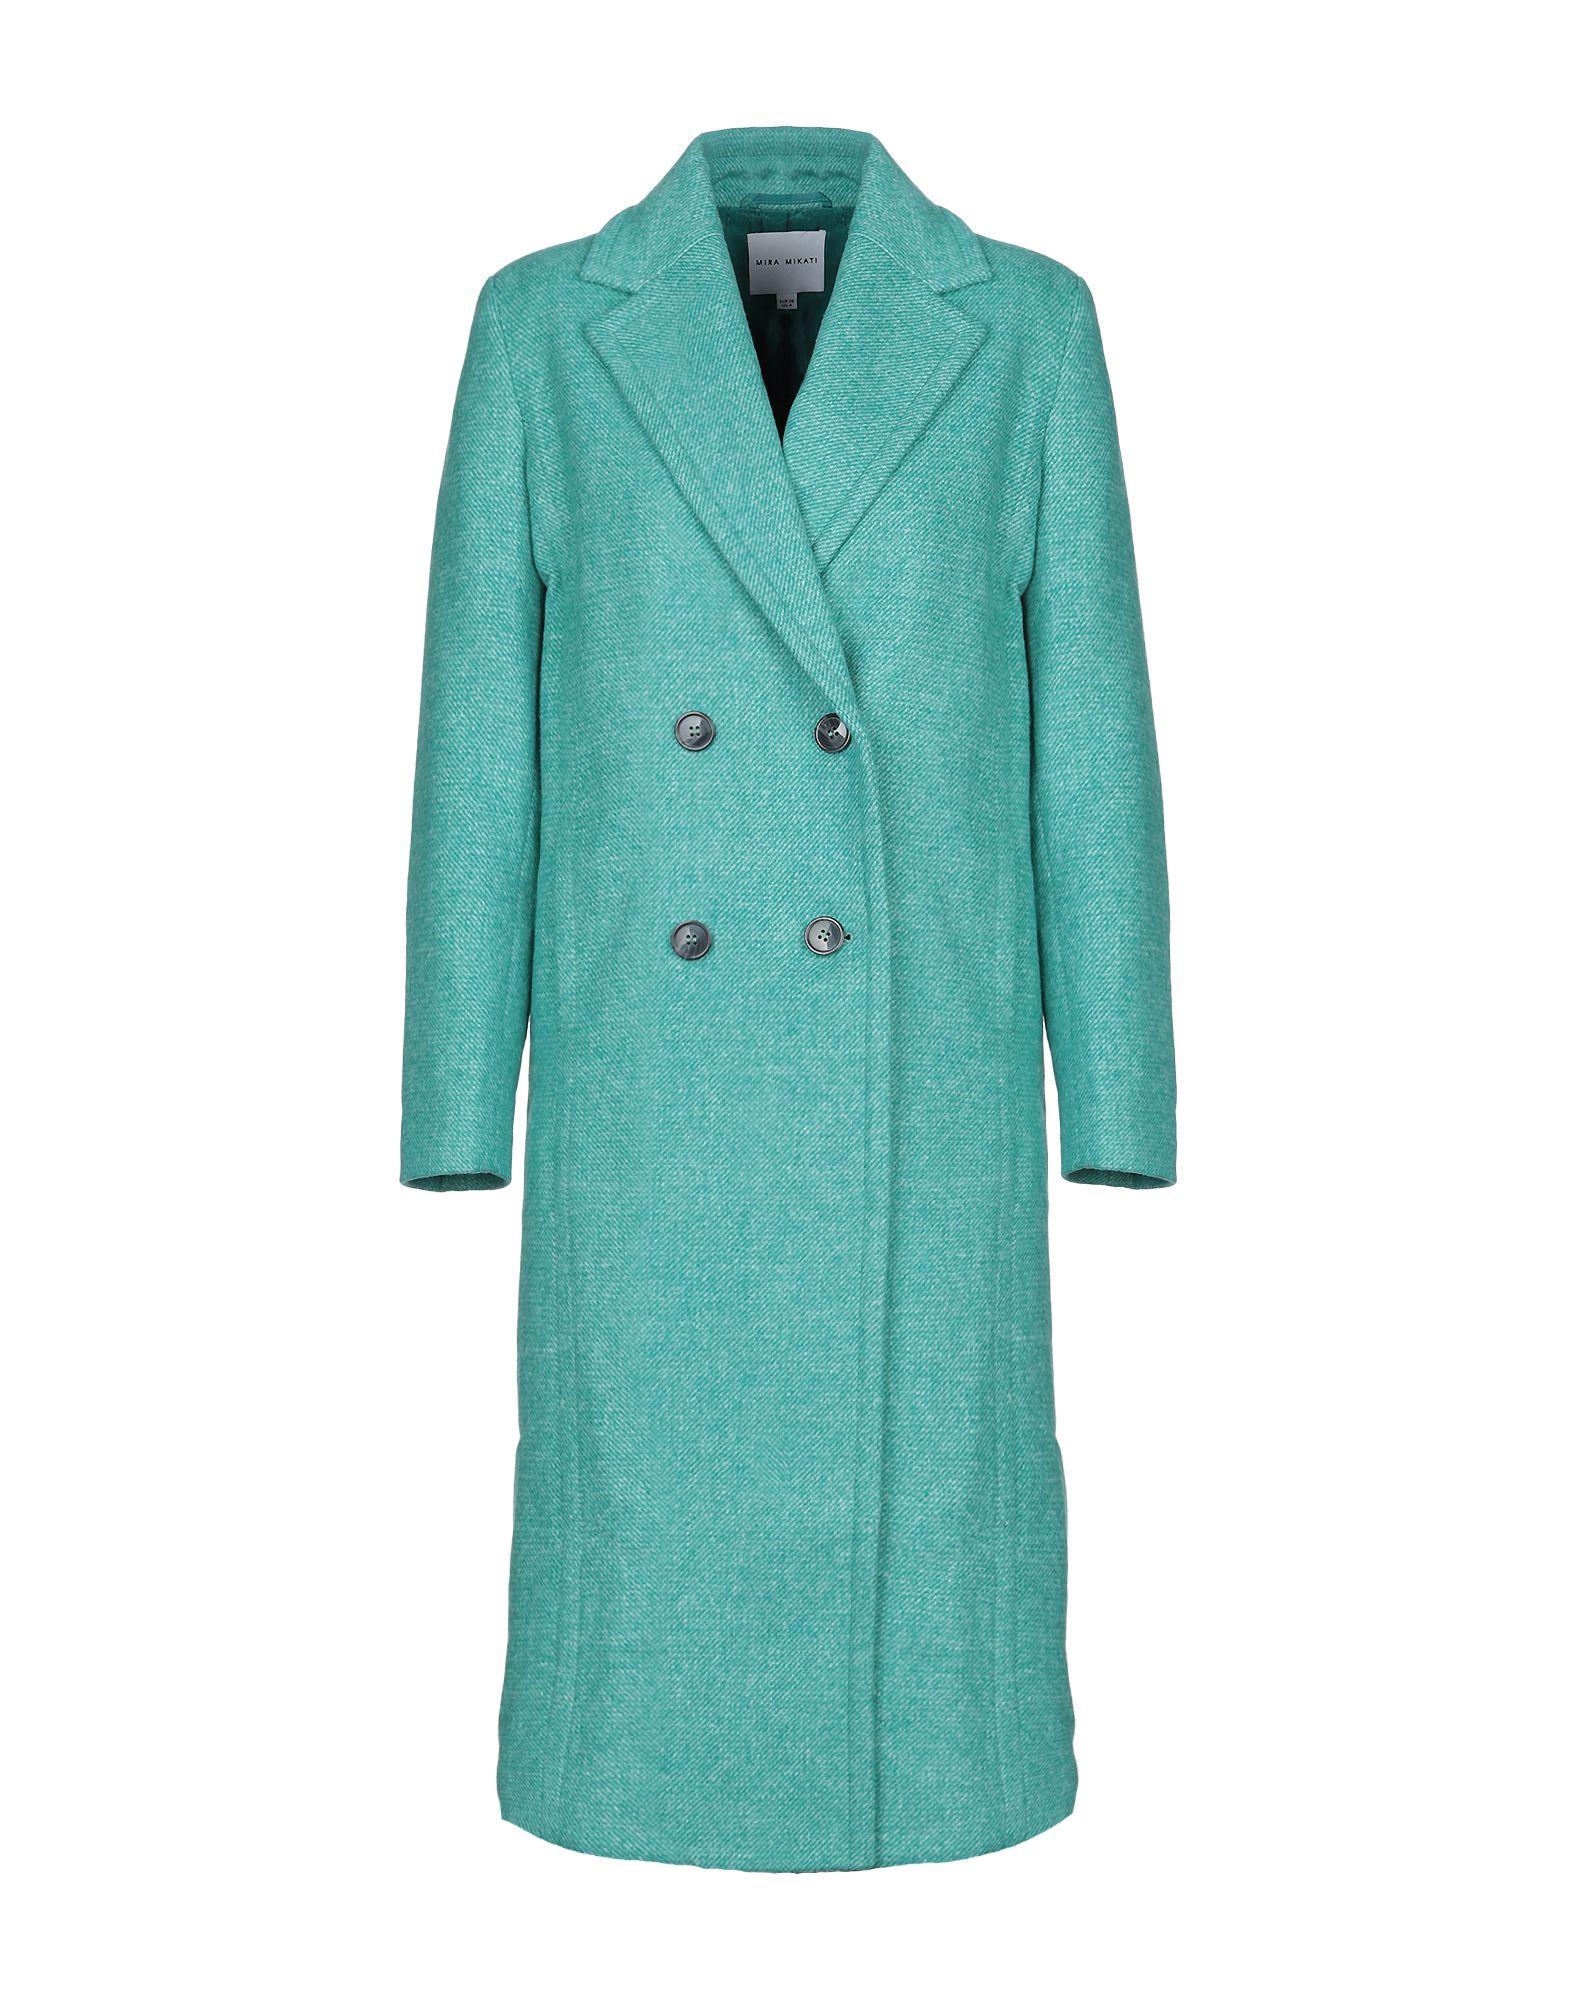 MIRA MIKATI Пальто mira mikati хлопковая рубашка с вышивкой на спине